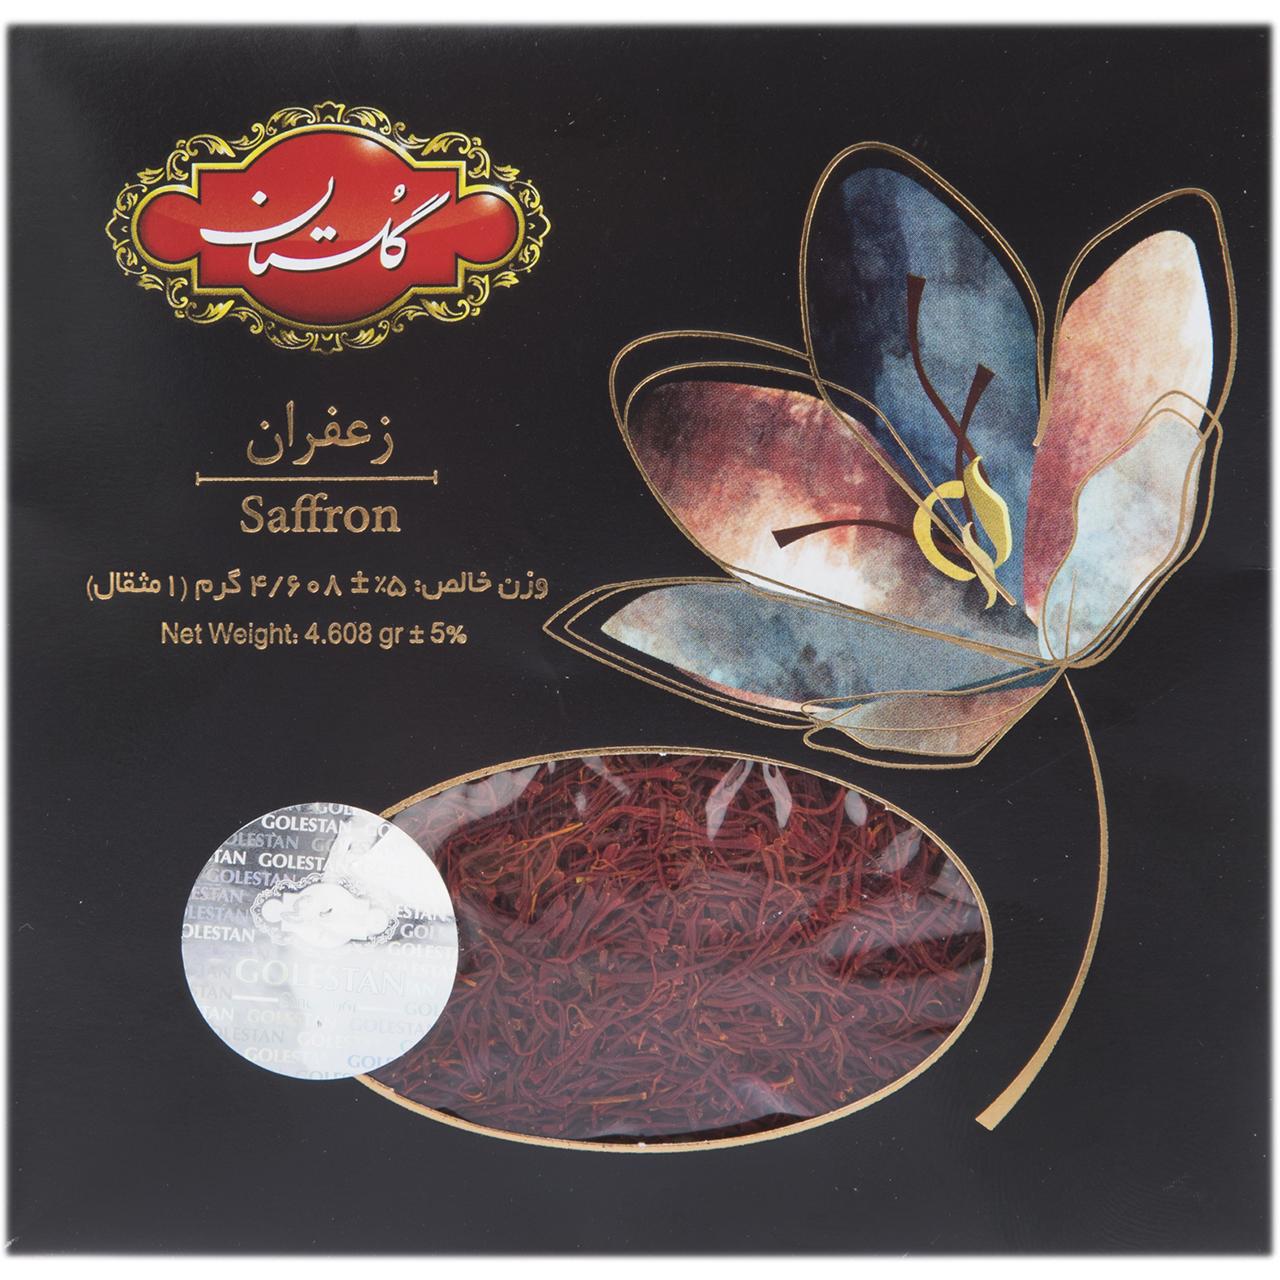 Golestan saffron, 4.608 grams